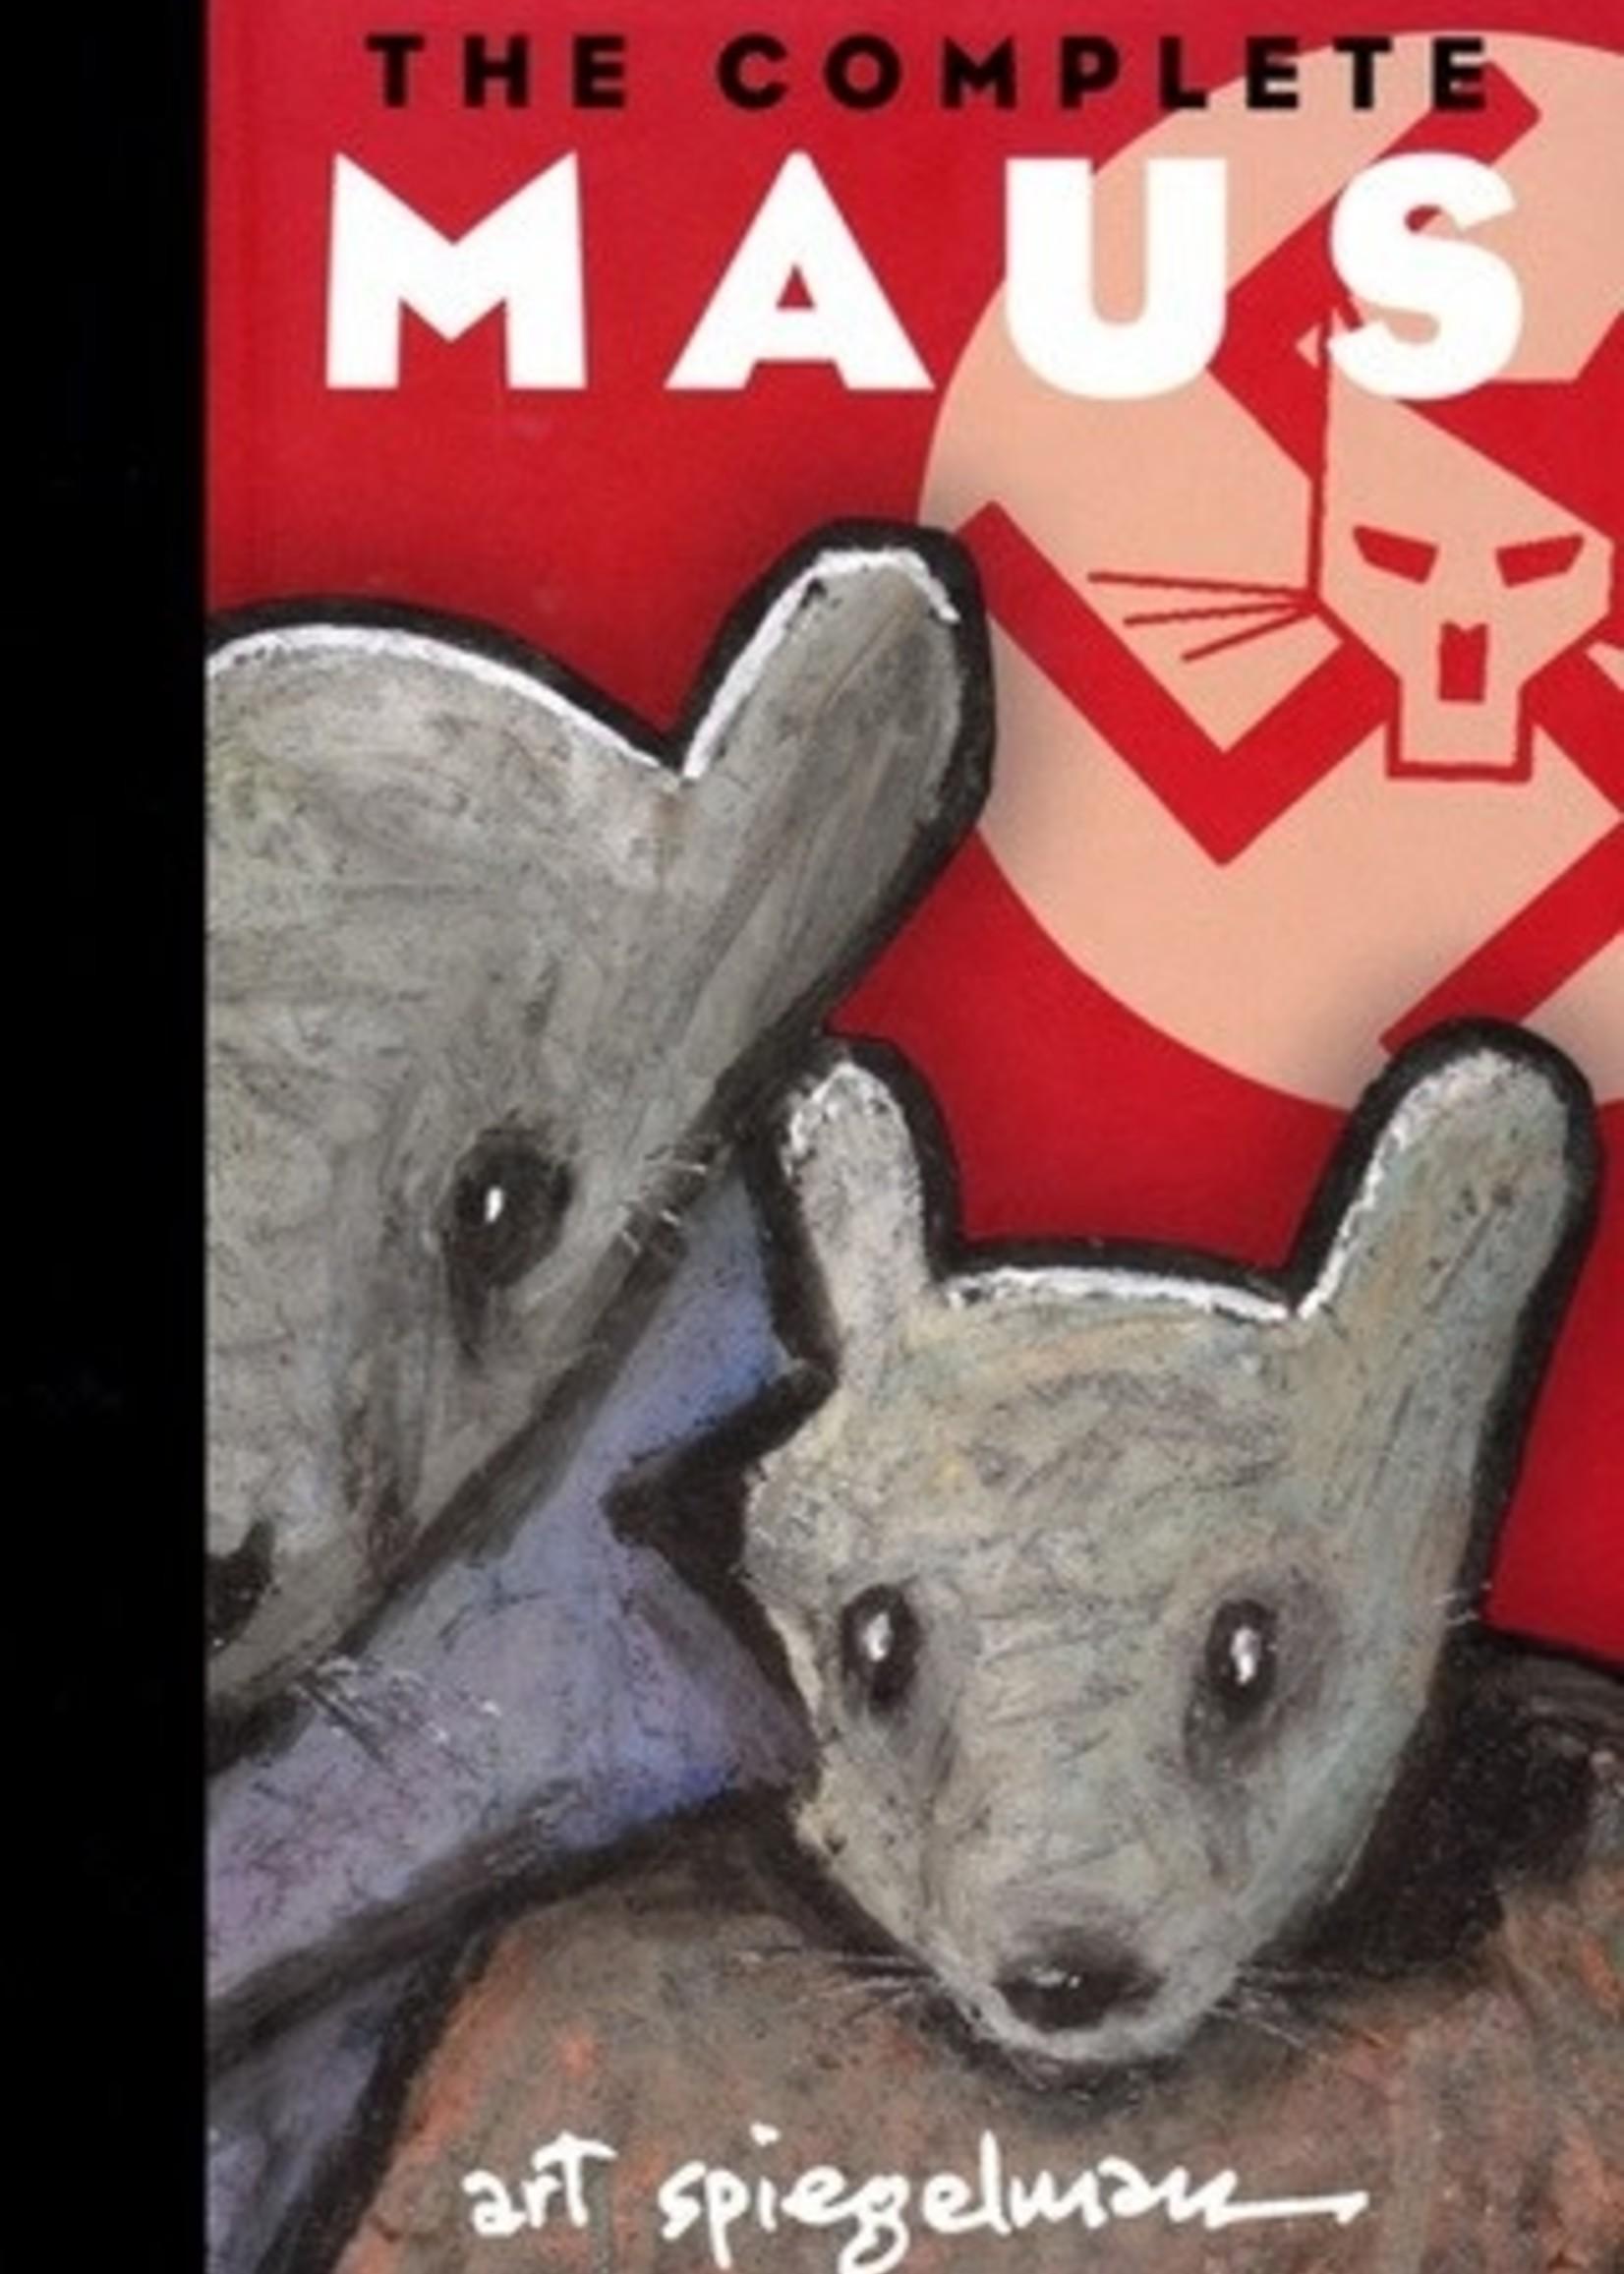 The Complete Maus: A Survivor's Tale (Maus #1-2) by Art Spiegelman